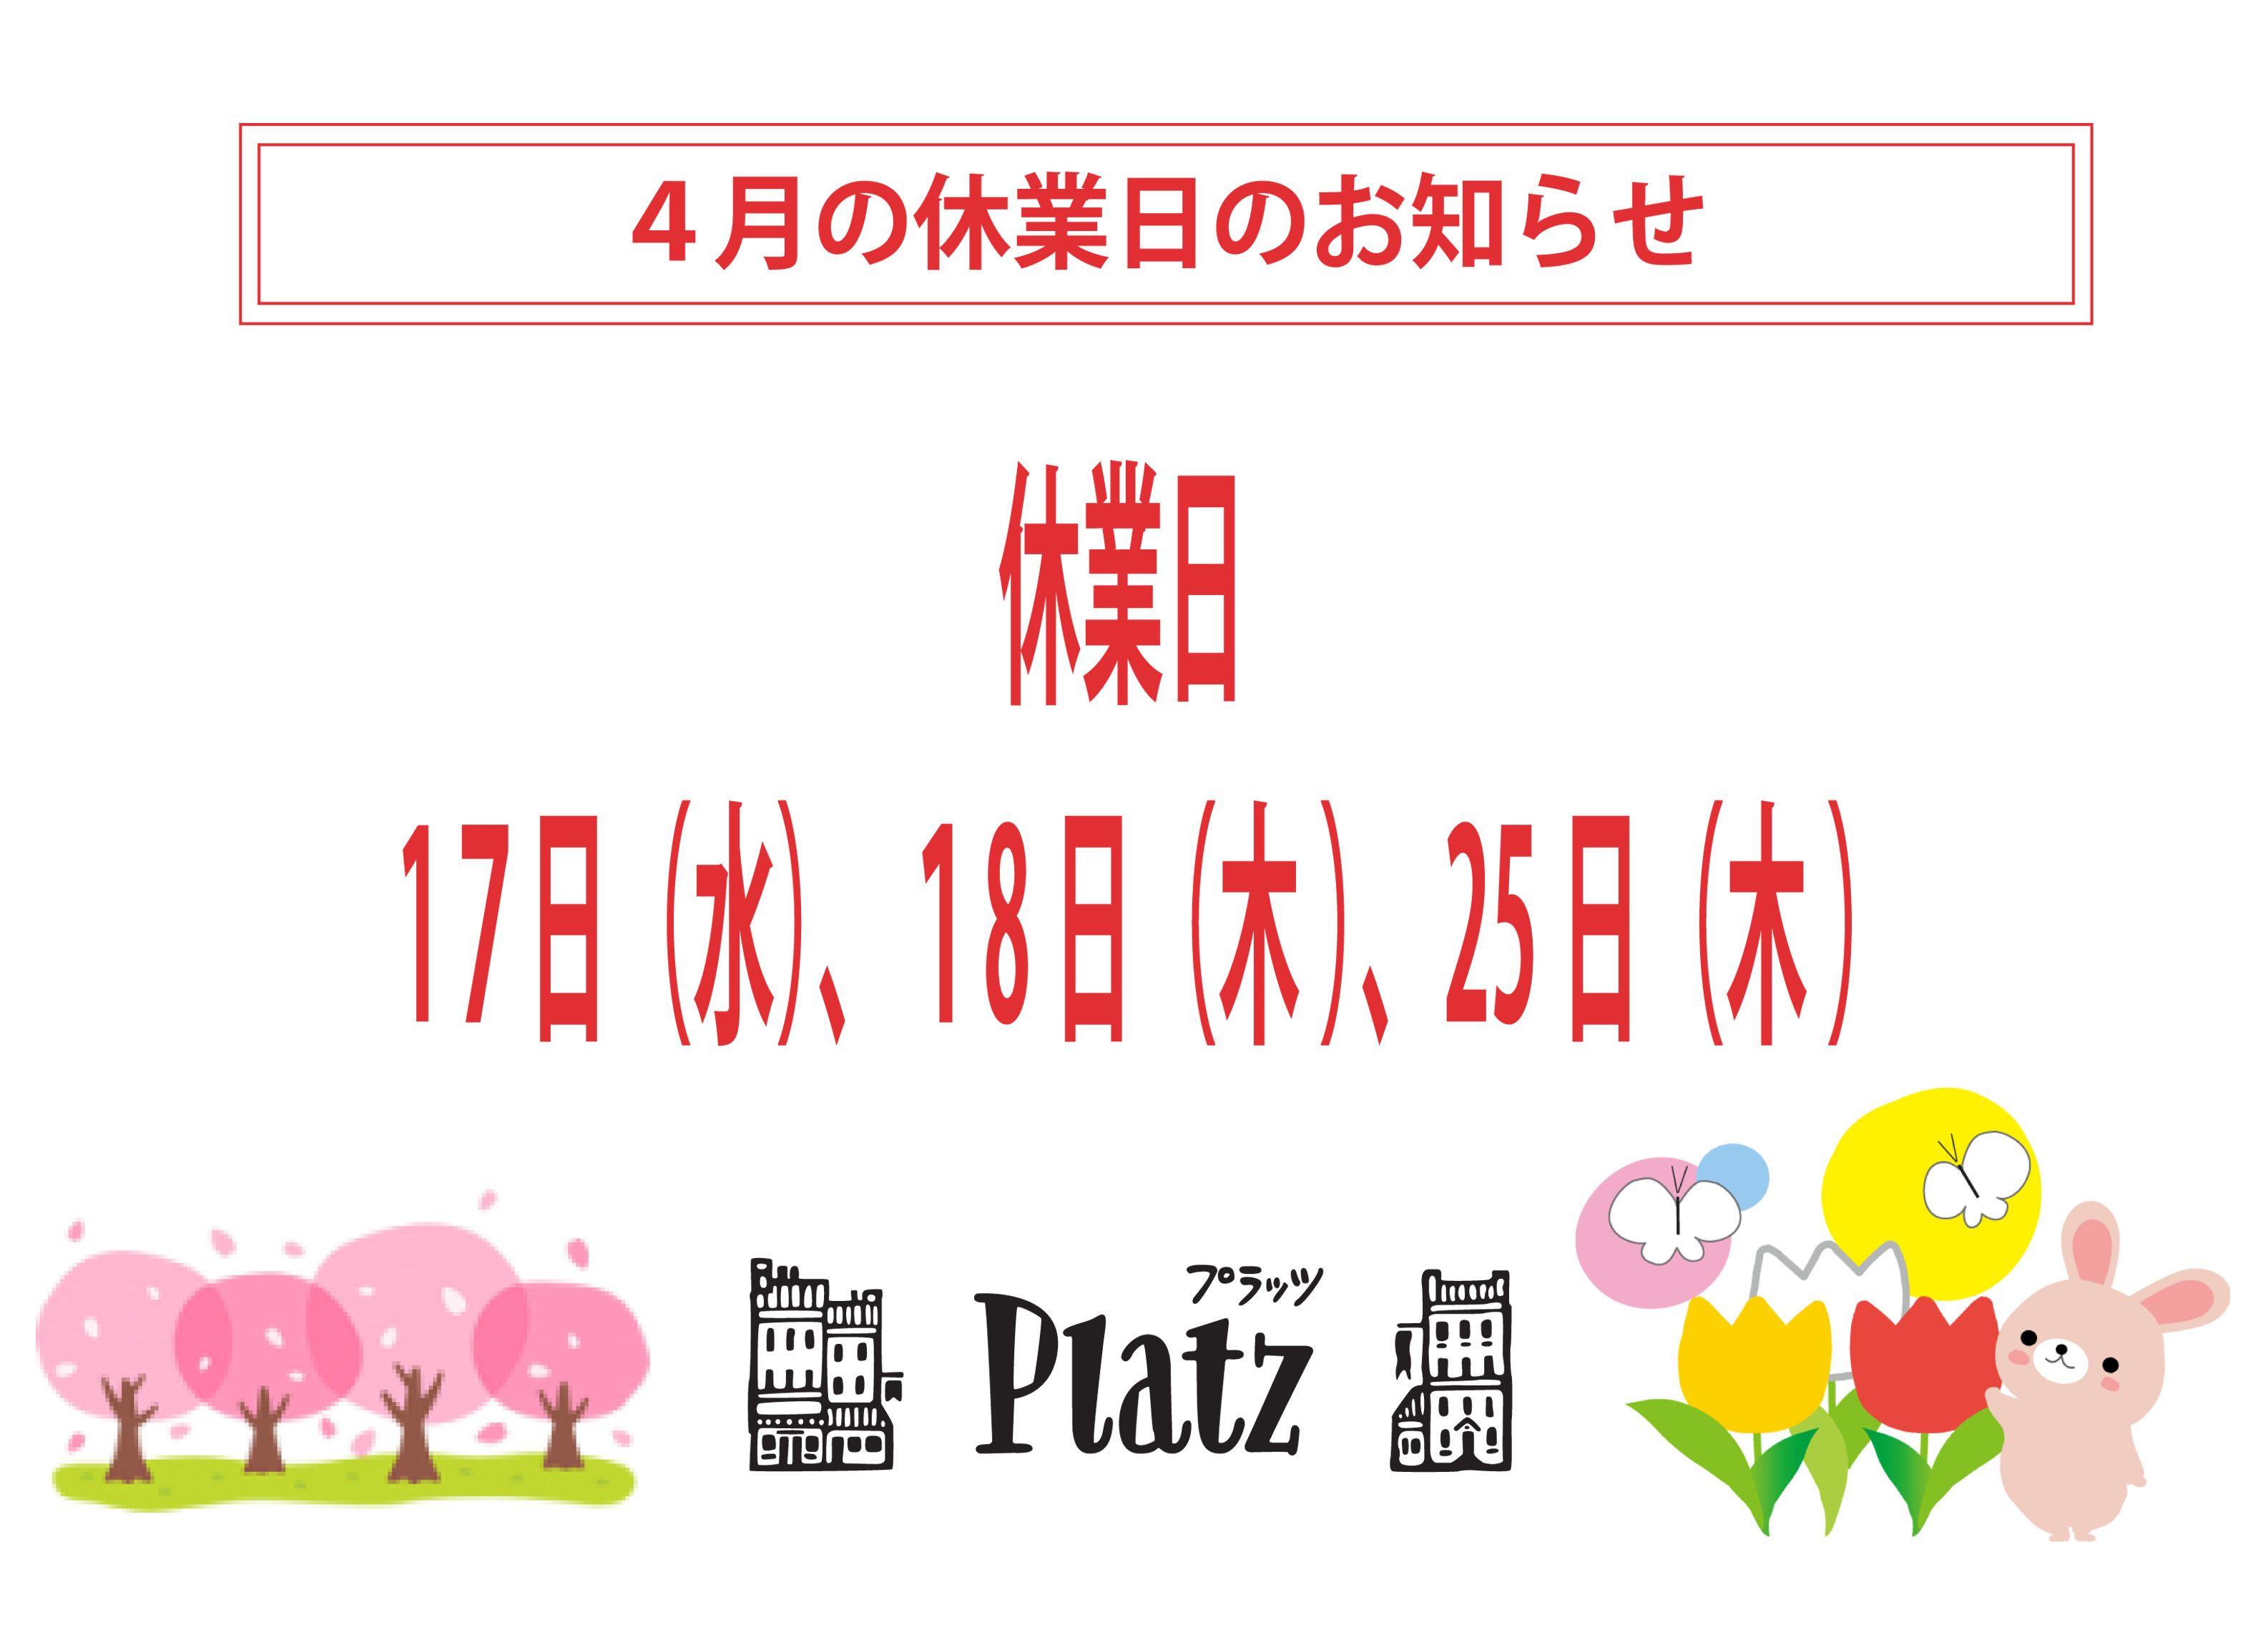 http://www.kyoto-platz.jp/news/images/4%E6%9C%88%E4%BC%91%E3%81%BF.jpg